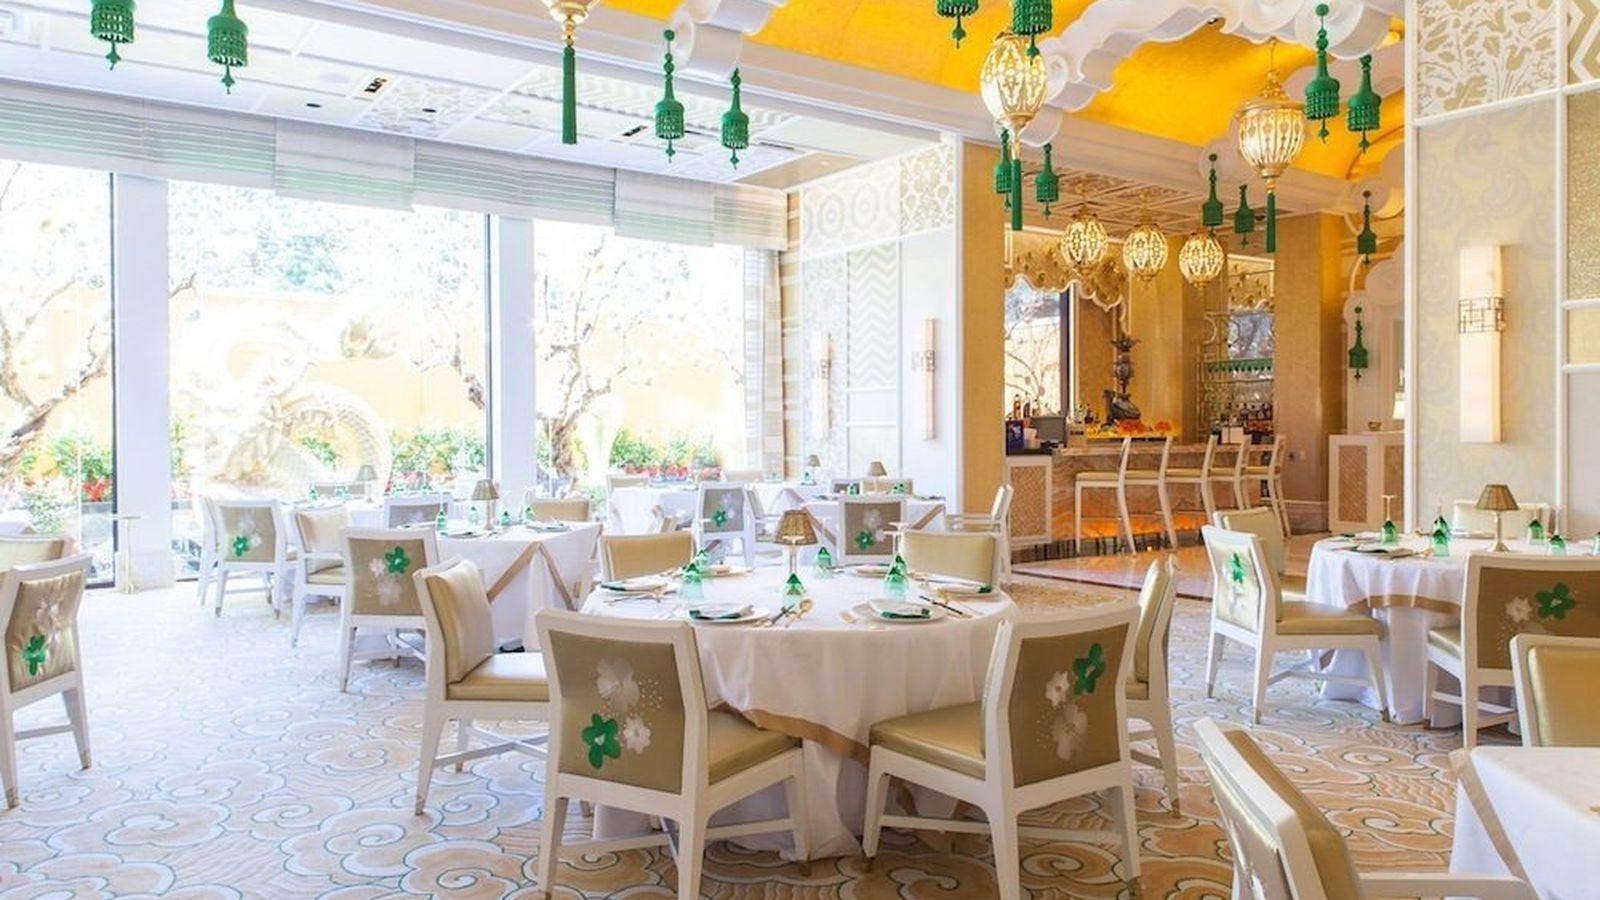 Wing_Lei_Restaurant_custom Ormolu Sconces_photo by VegasEater.com.jpg